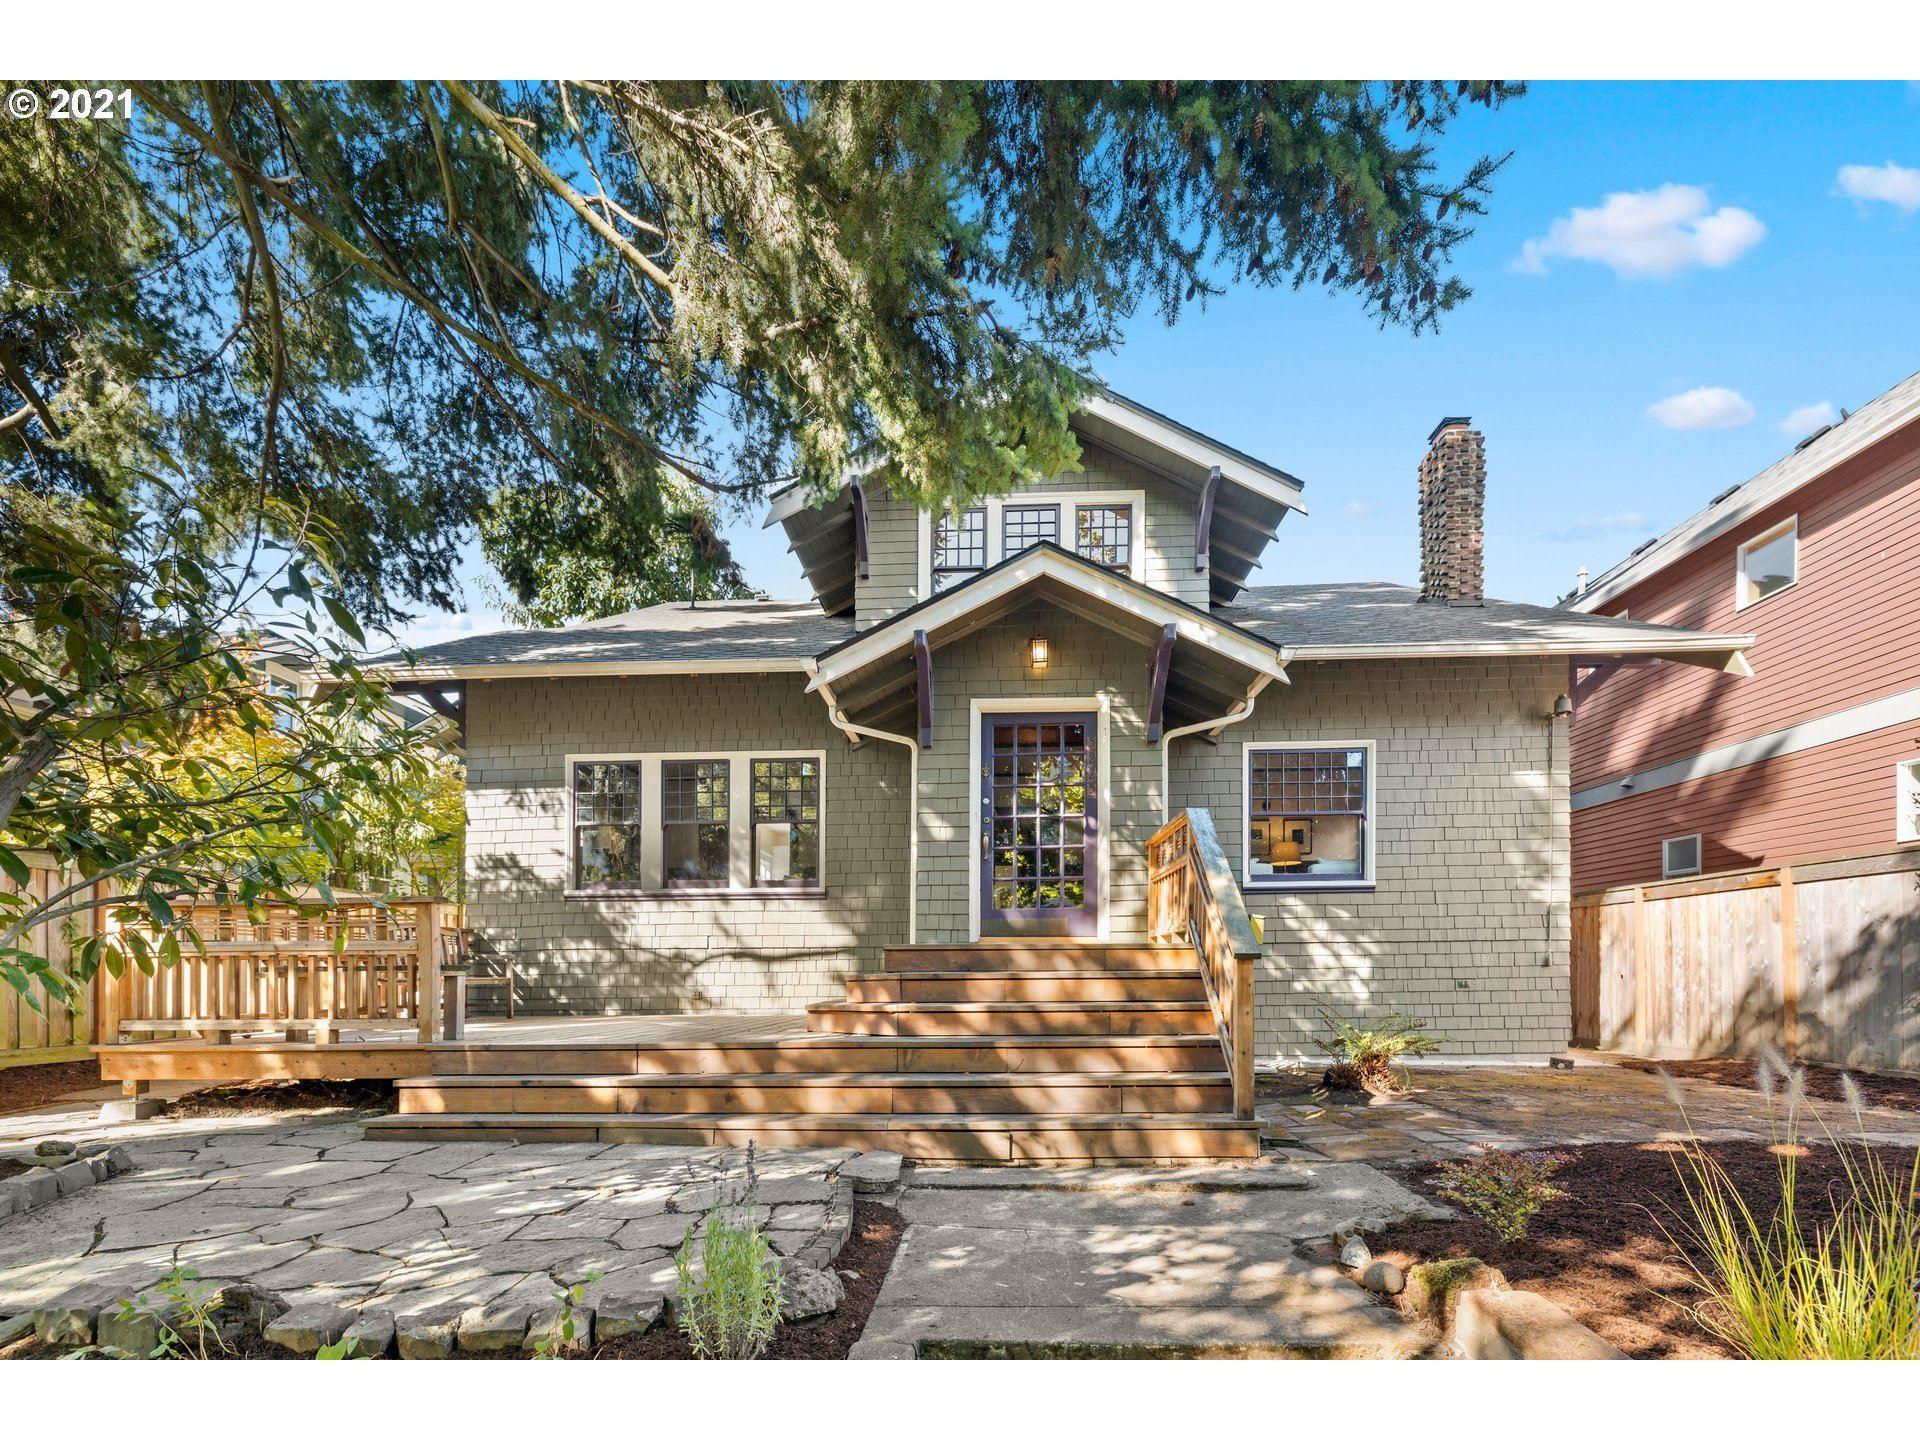 5225 NE GARFIELD AVE, Portland, OR 97211 - MLS#: 21498440